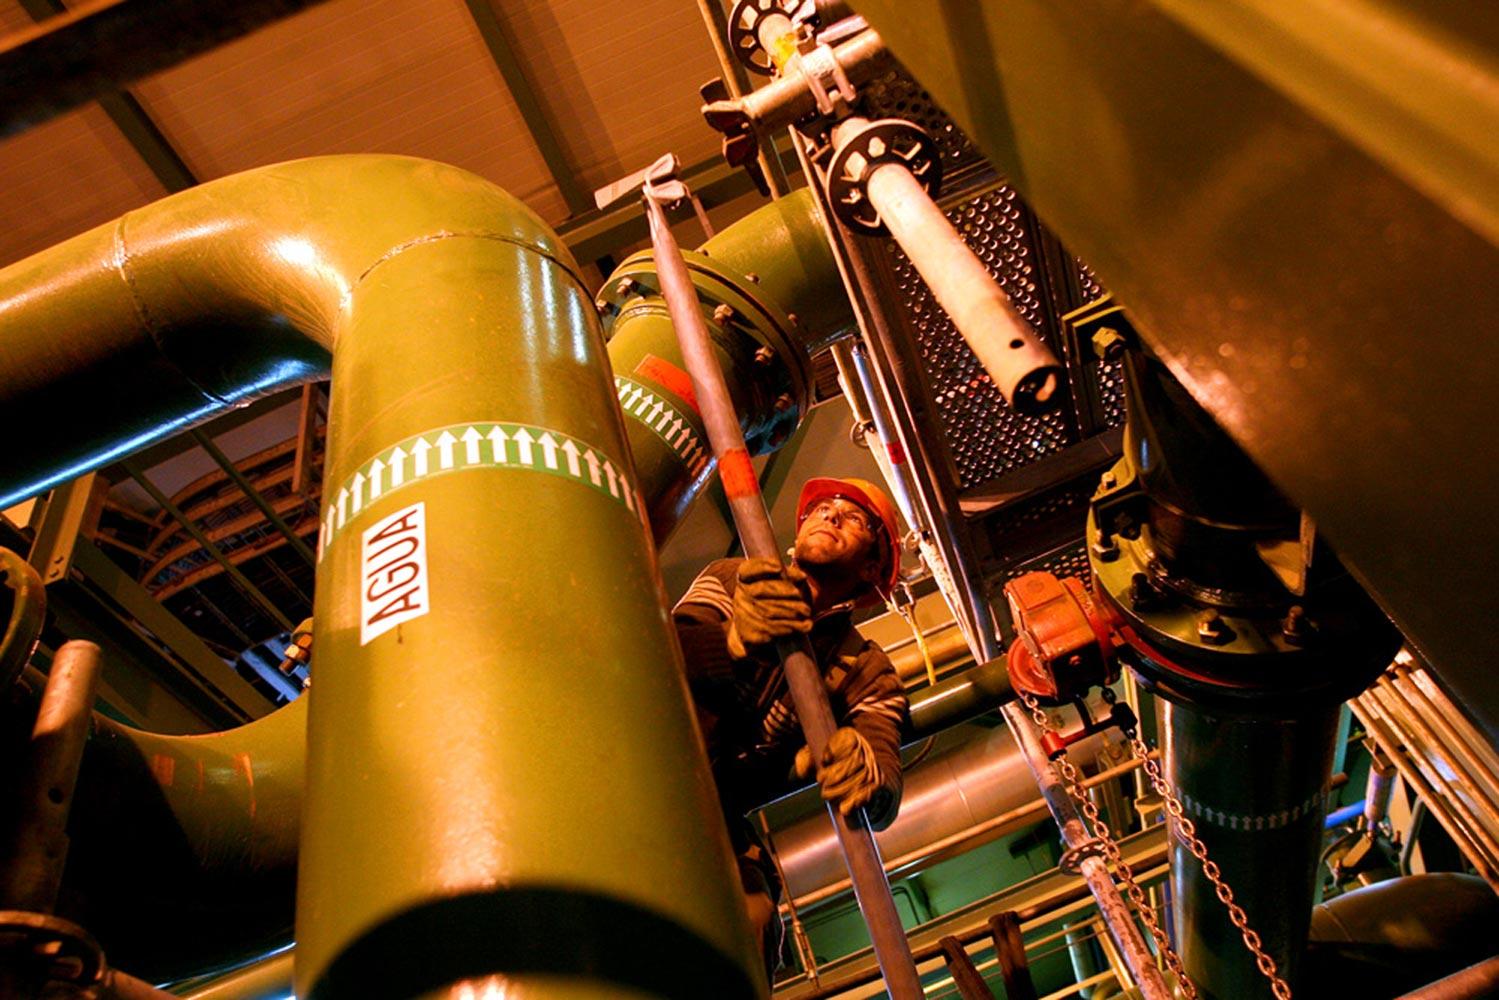 16-industrial-turbina-cicle-combinat-alstom-004